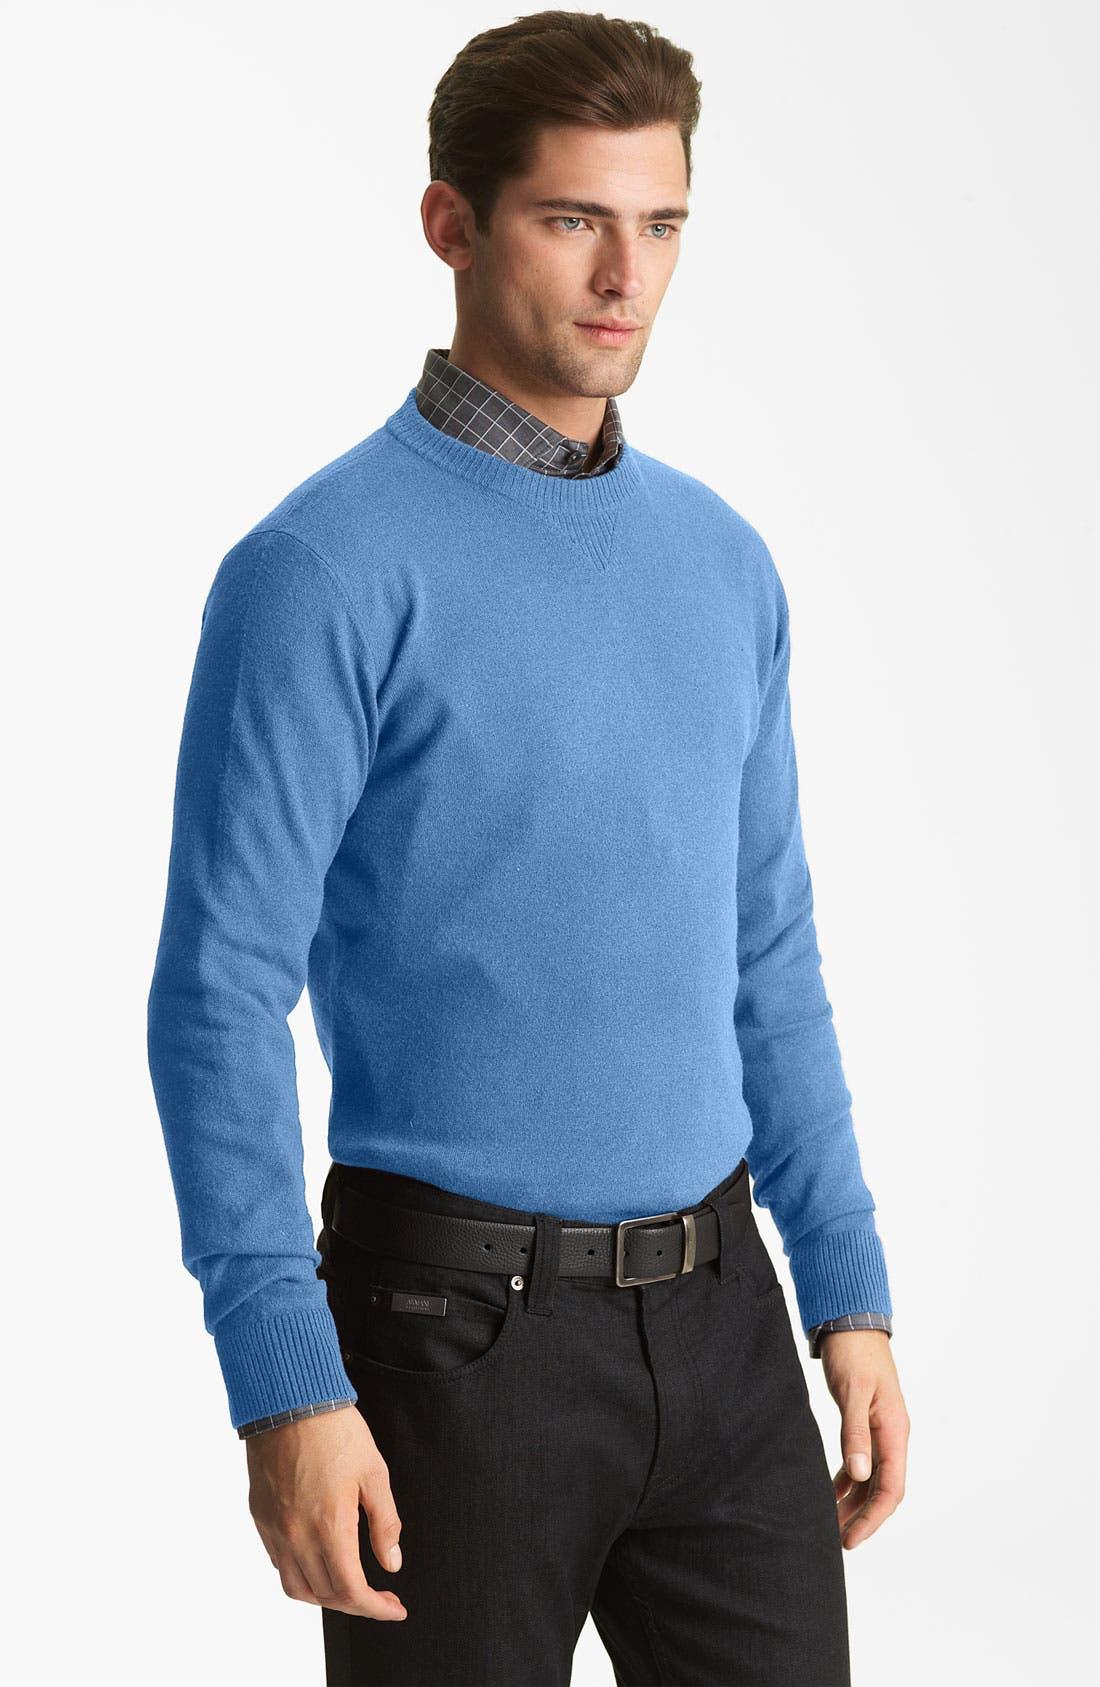 Alternate Image 1 Selected - Armani Collezioni Crewneck Sweater